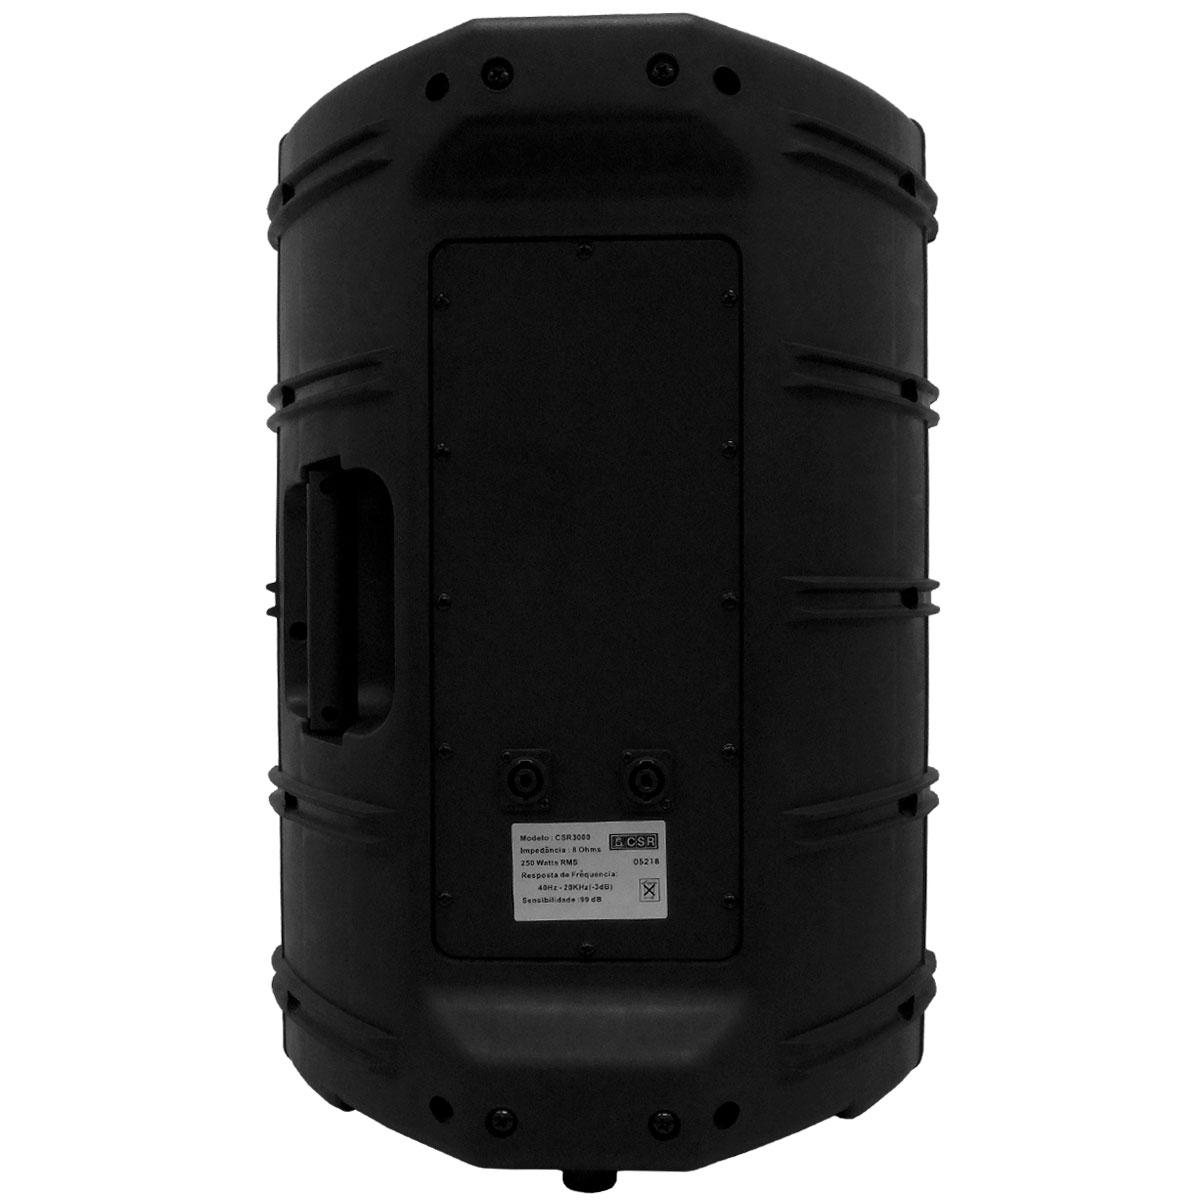 Caixa Passiva Fal 12 Pol 250W - CSR 3000